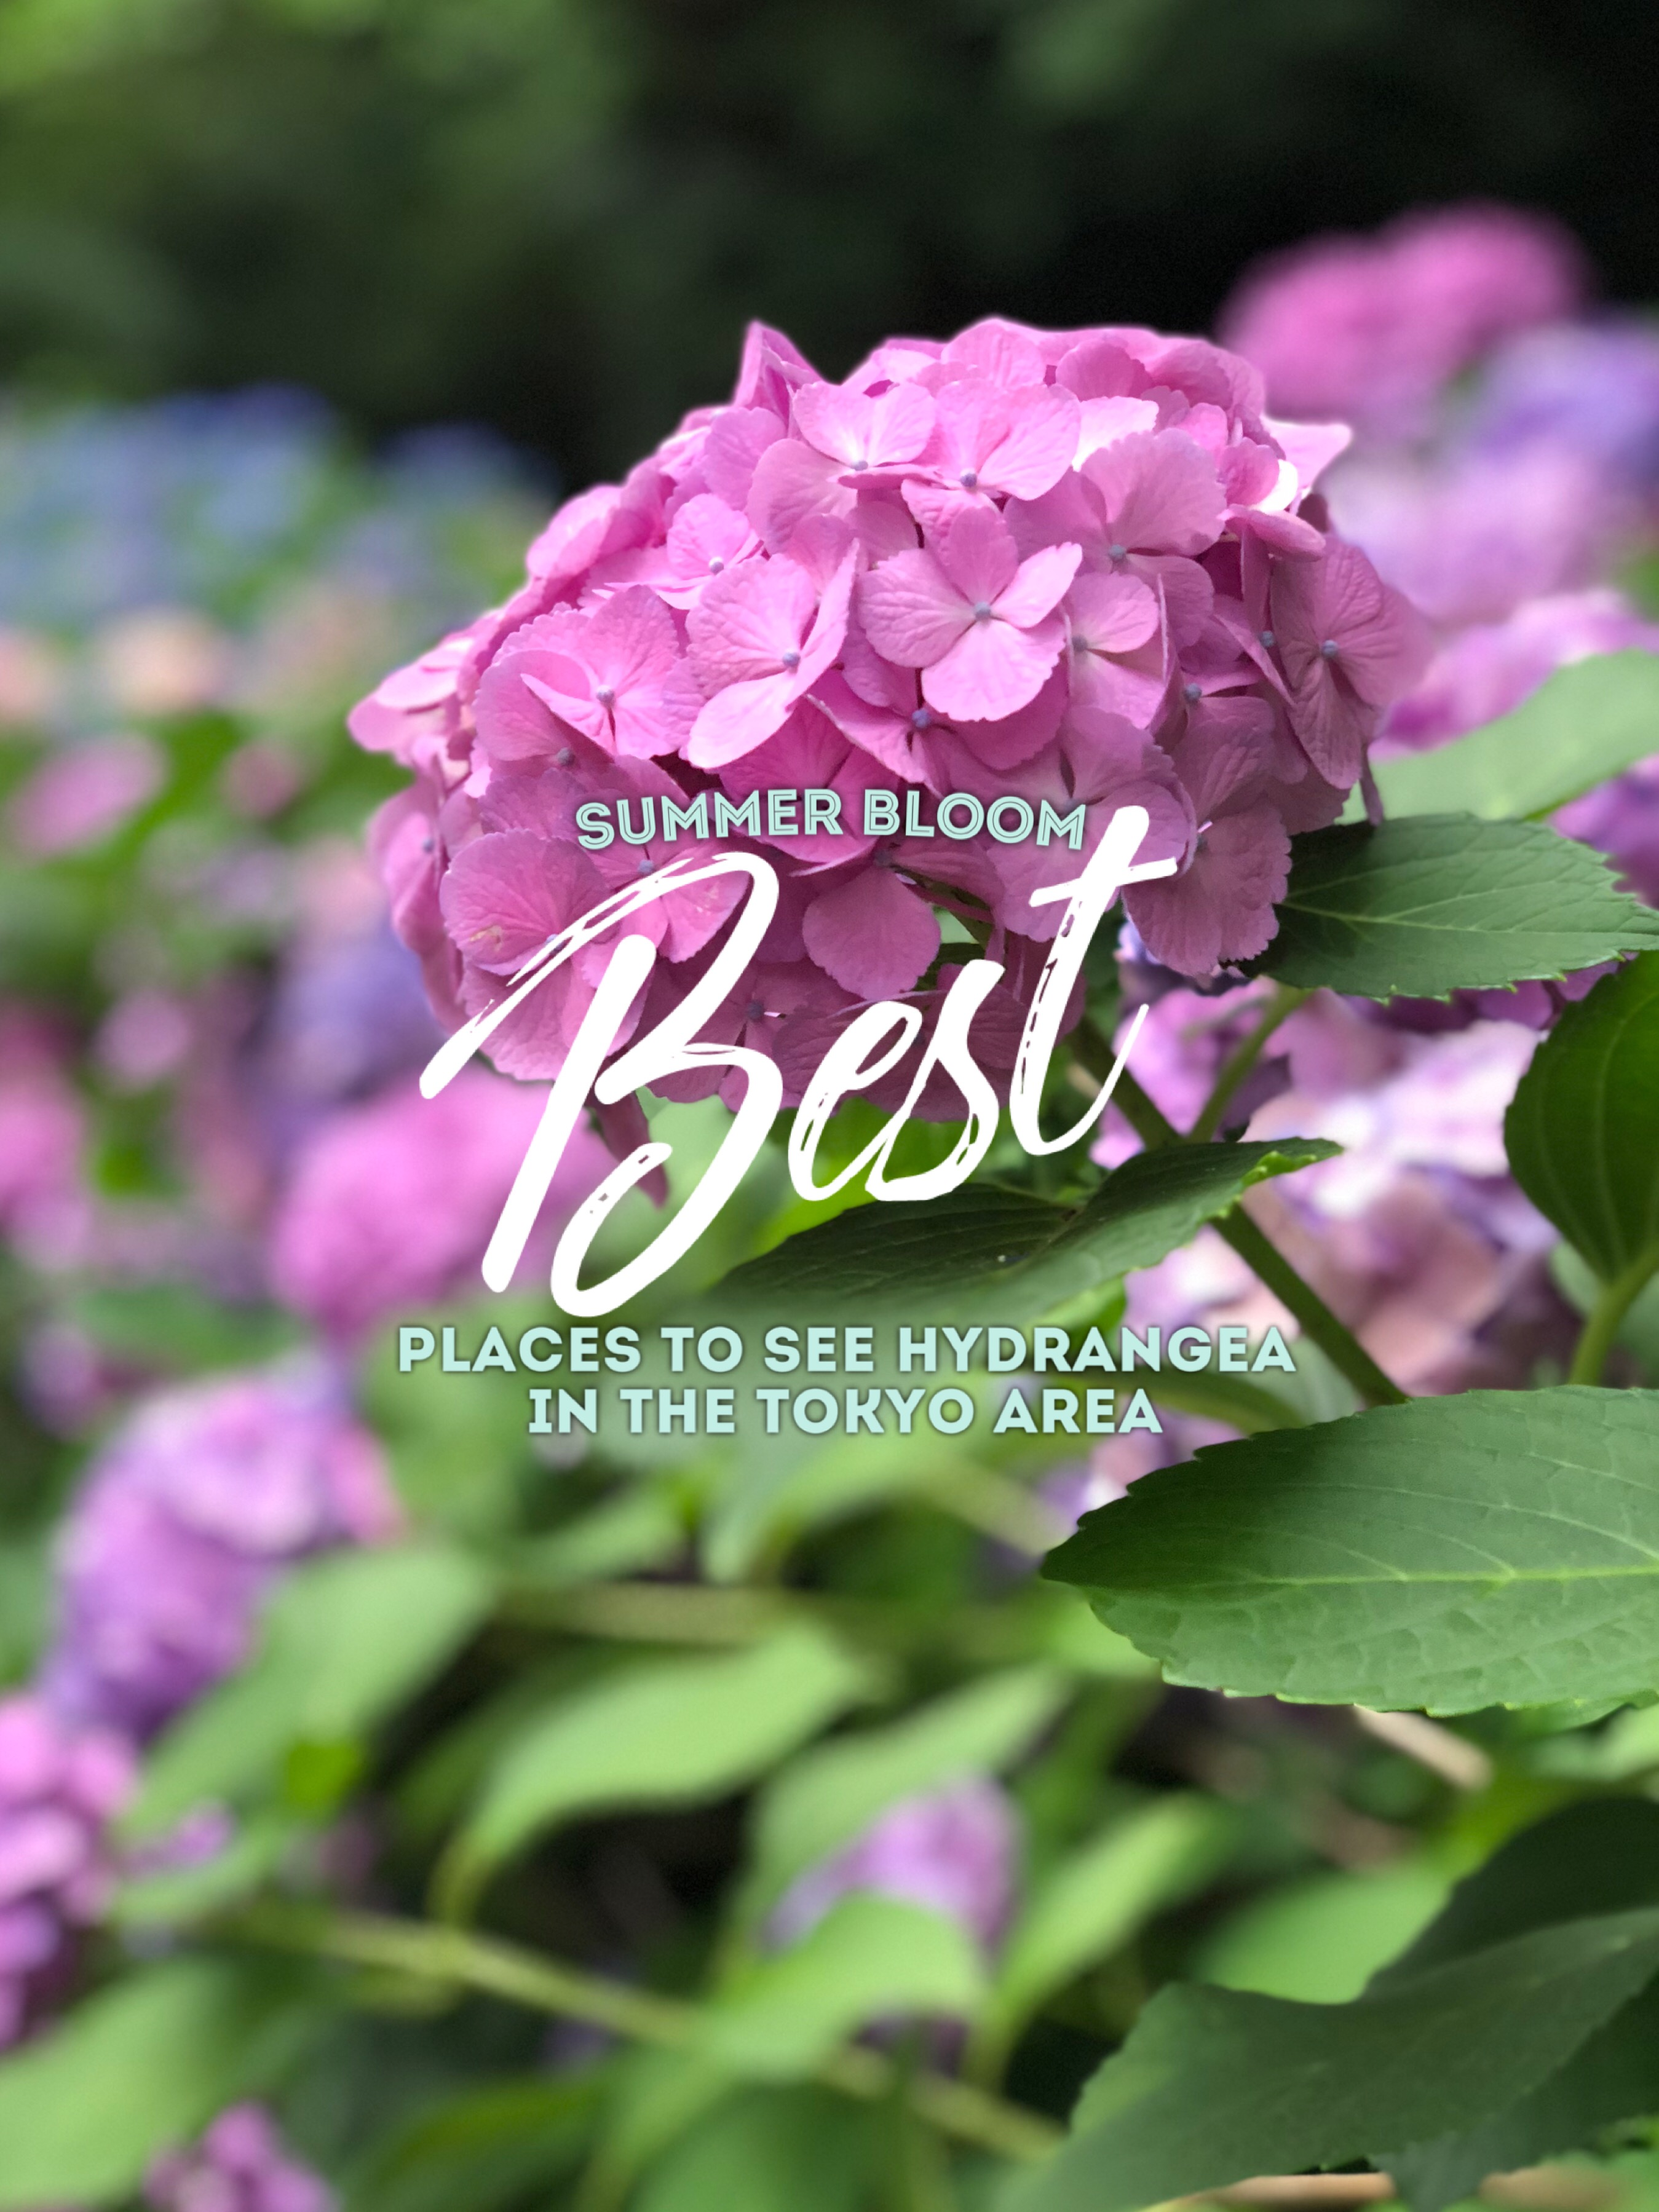 The Summer Bloom. Tokyo.